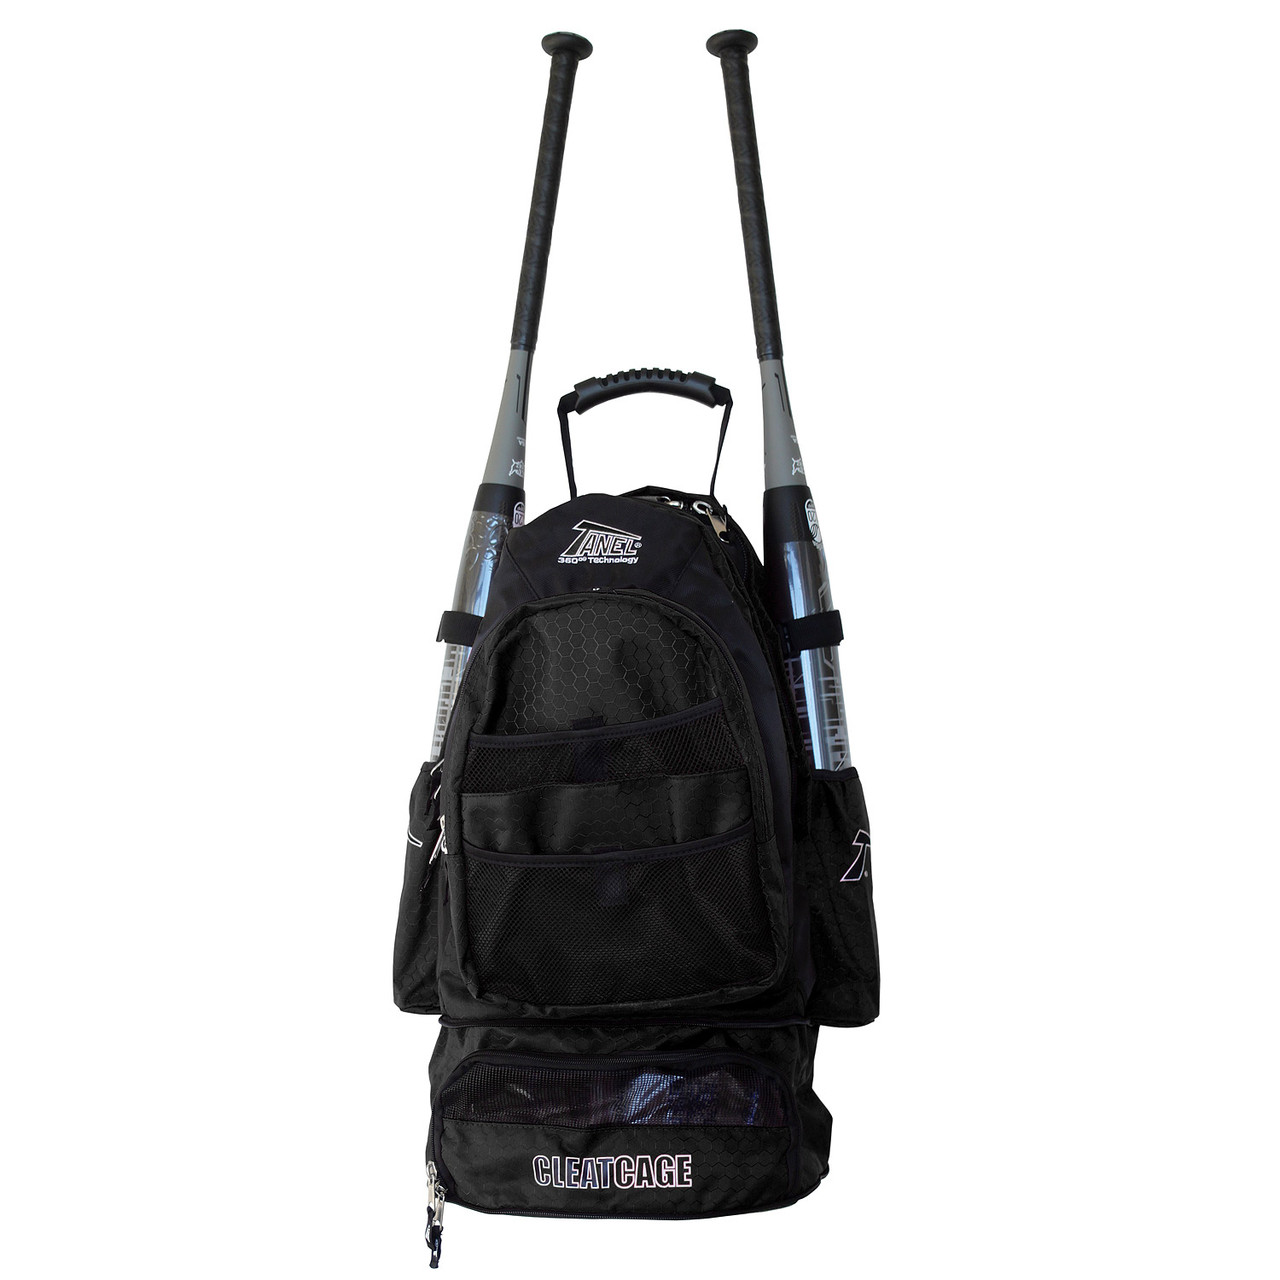 Tanel 360 BatPack Baseball/Softball Backpack Bag